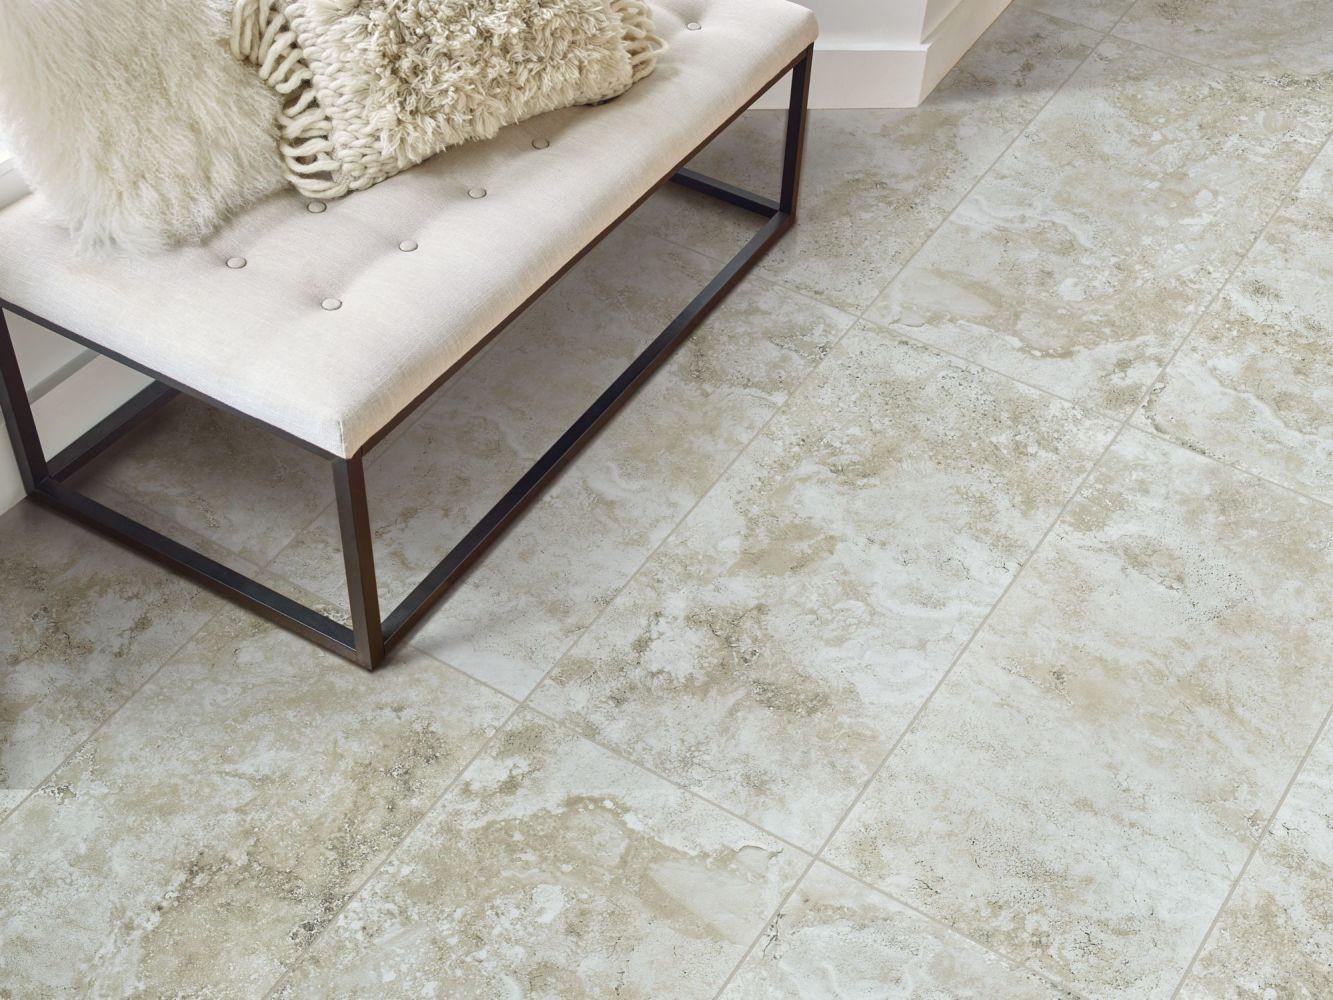 Shaw Floors Home Fn Gold Ceramic Cassio Mosaic Beige 00200_TG10E